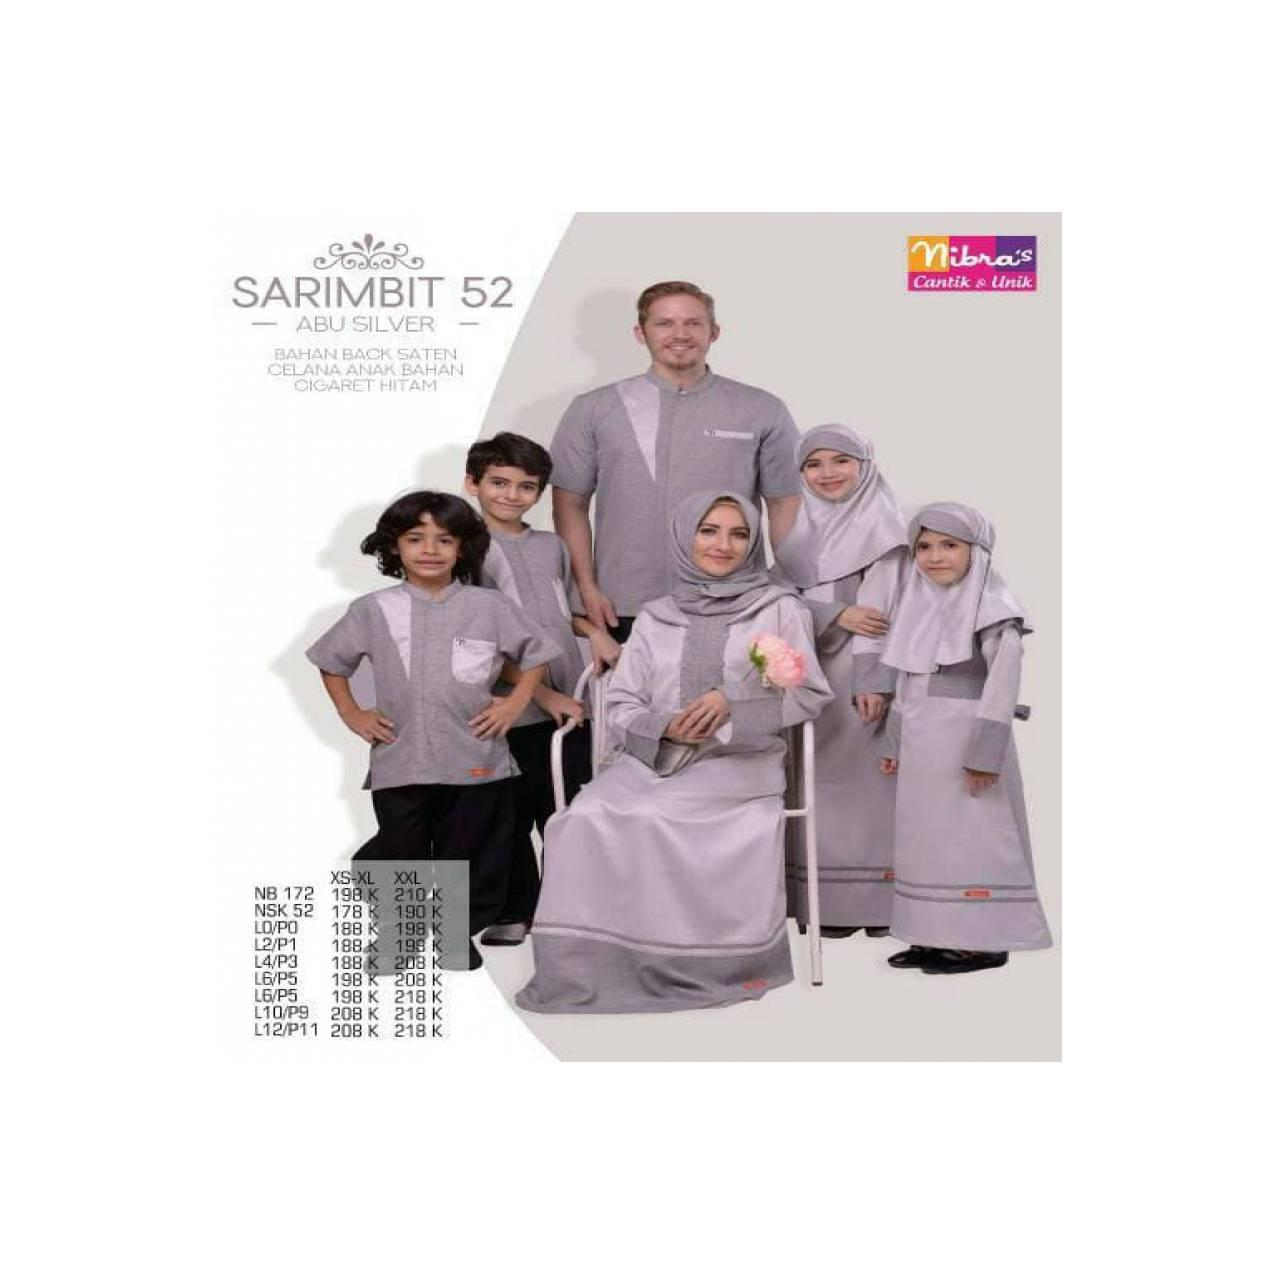 Nibras Sarimbit 52 Abu Silver - Back Satin - Jual Baju Keluarga Muslim